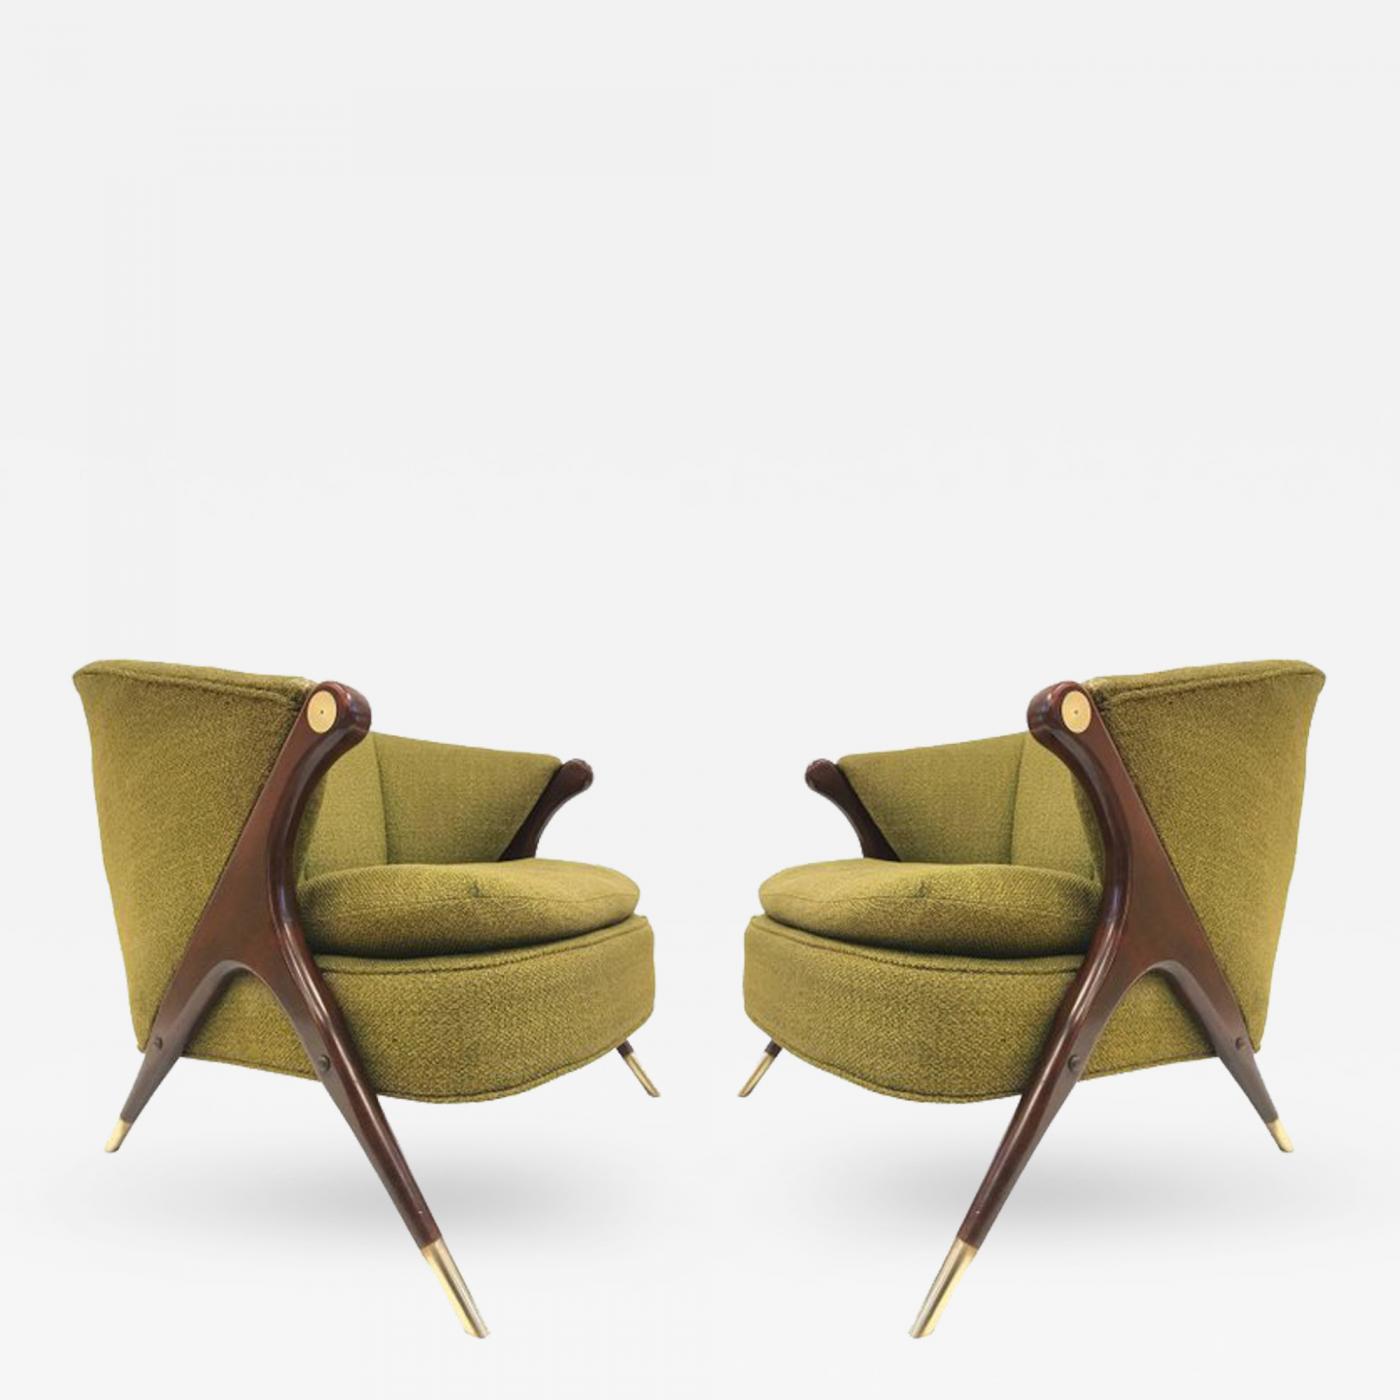 Awe Inspiring Karpen Of California Karpen Of California Mid Century Modern Lounge Chairs Pair Inzonedesignstudio Interior Chair Design Inzonedesignstudiocom